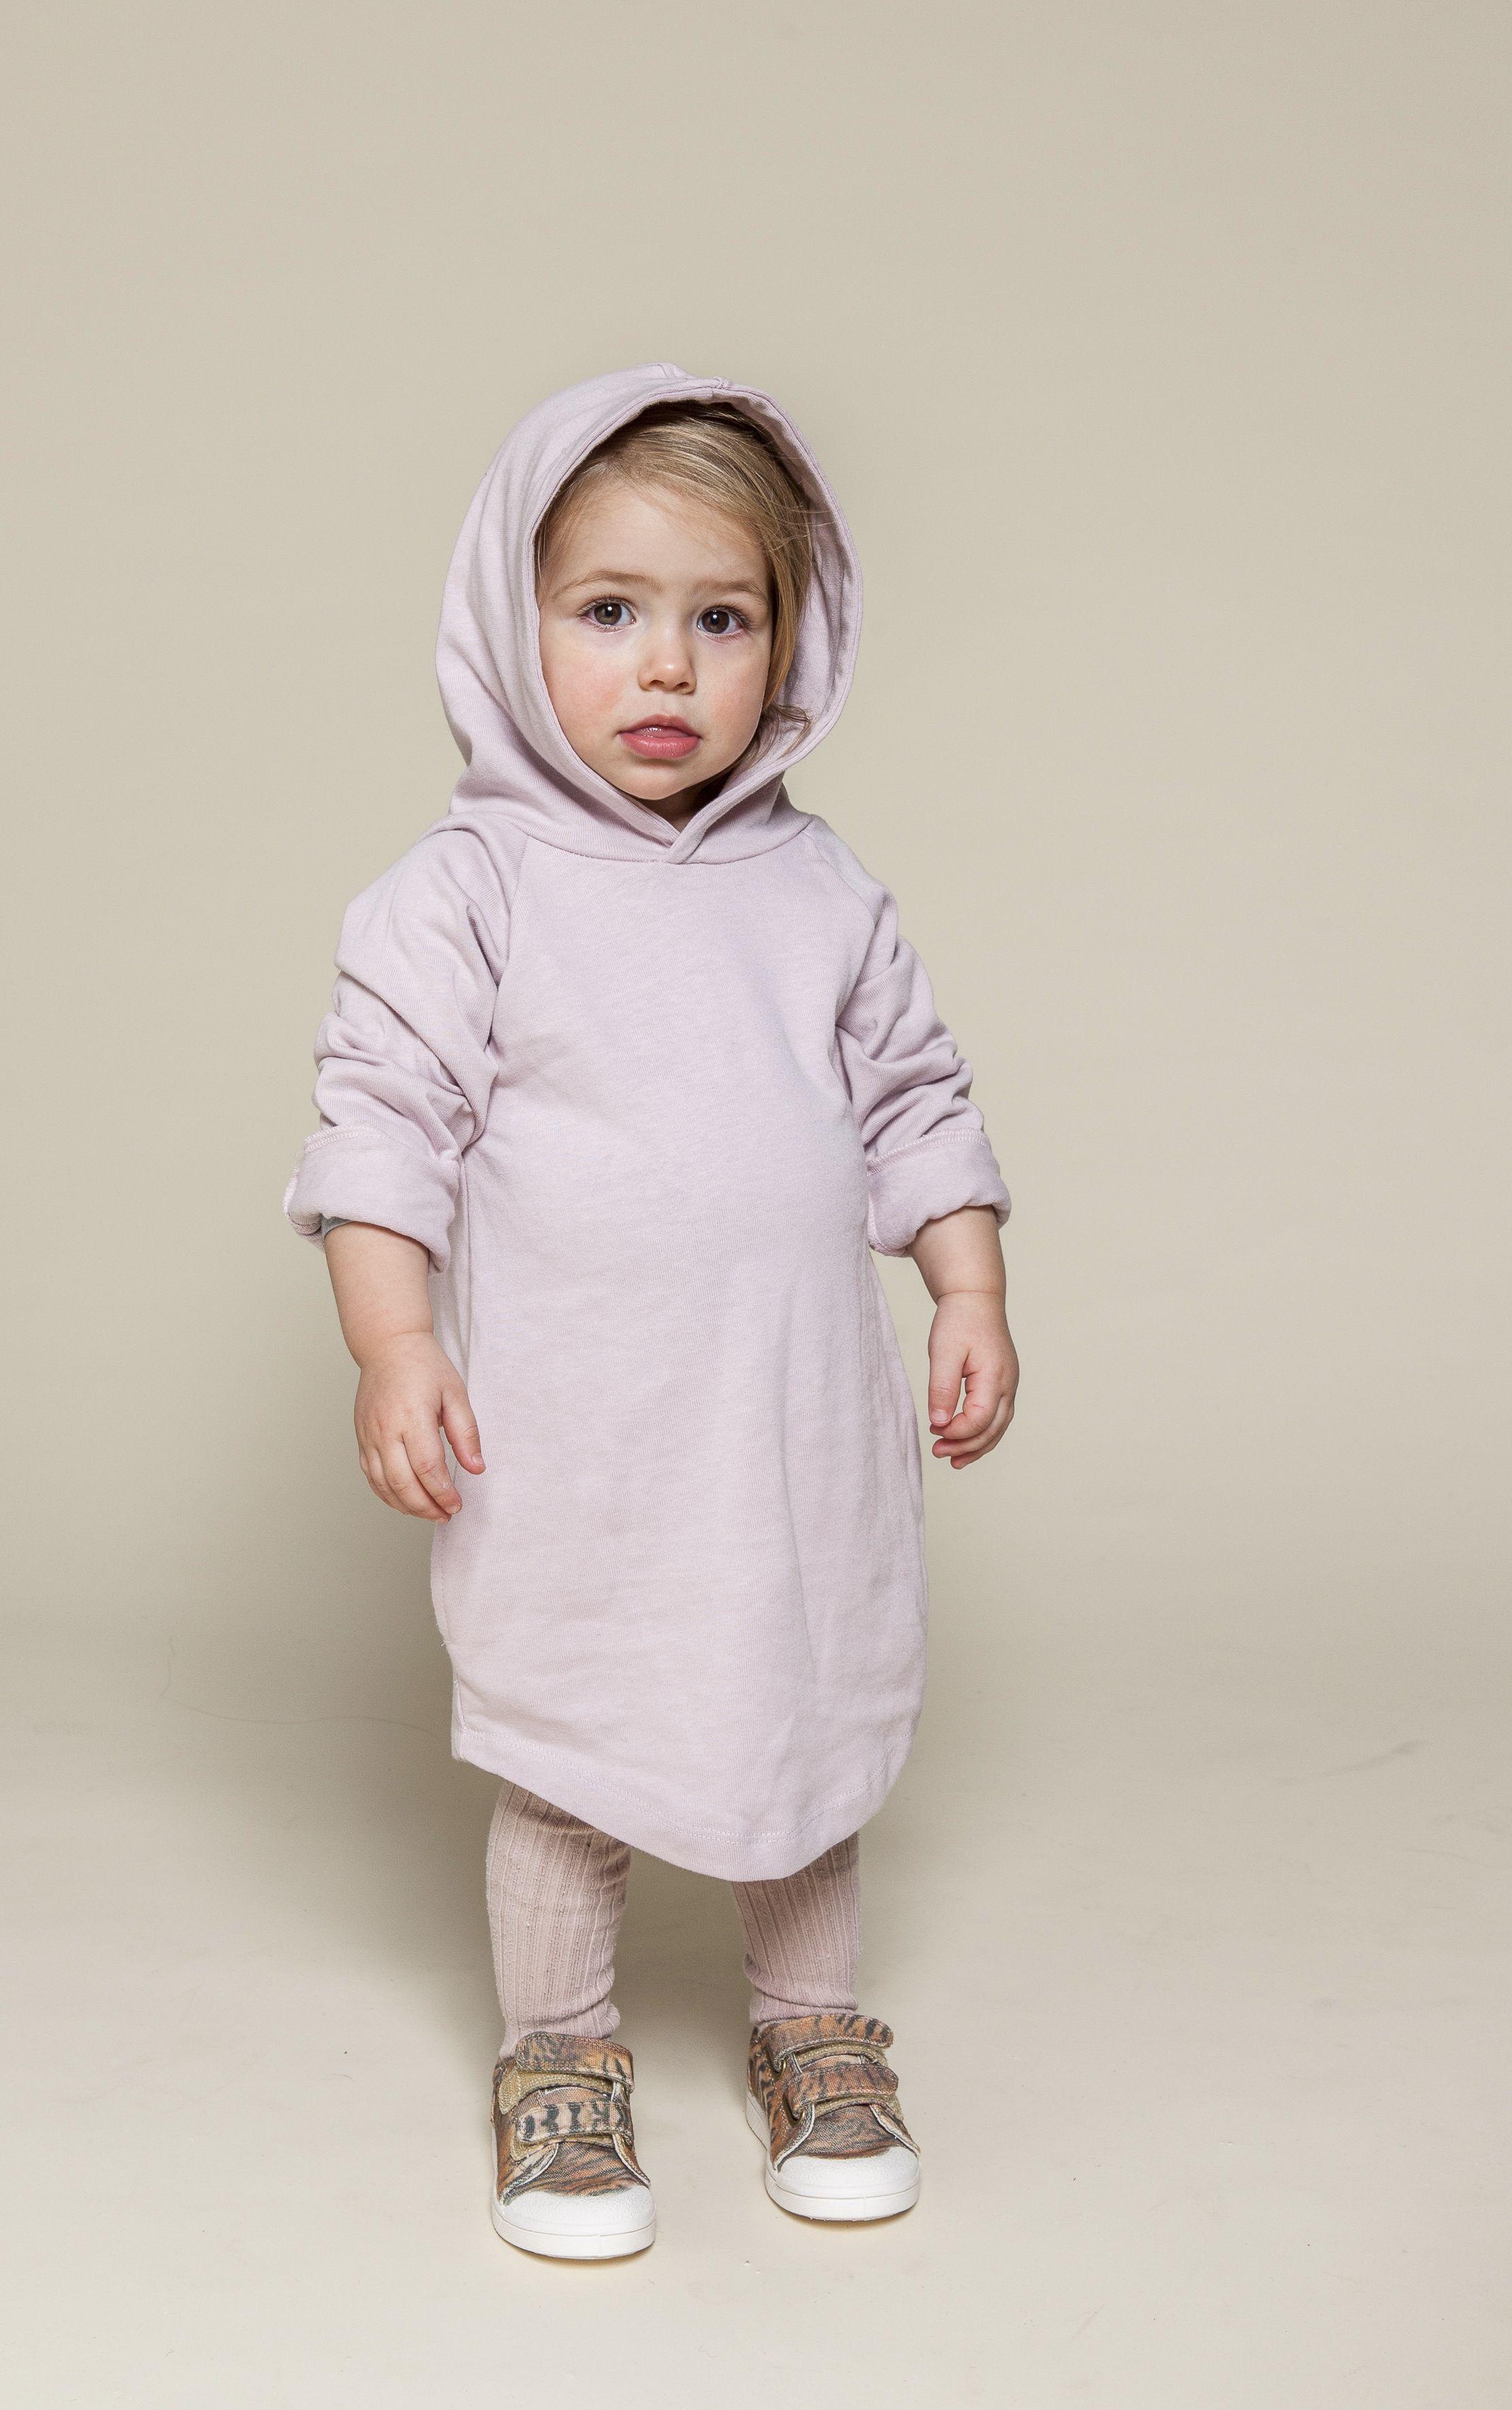 Kinderkleding Webshop.Uma In Gray Label Hooded Dress Kids Children Kinderen